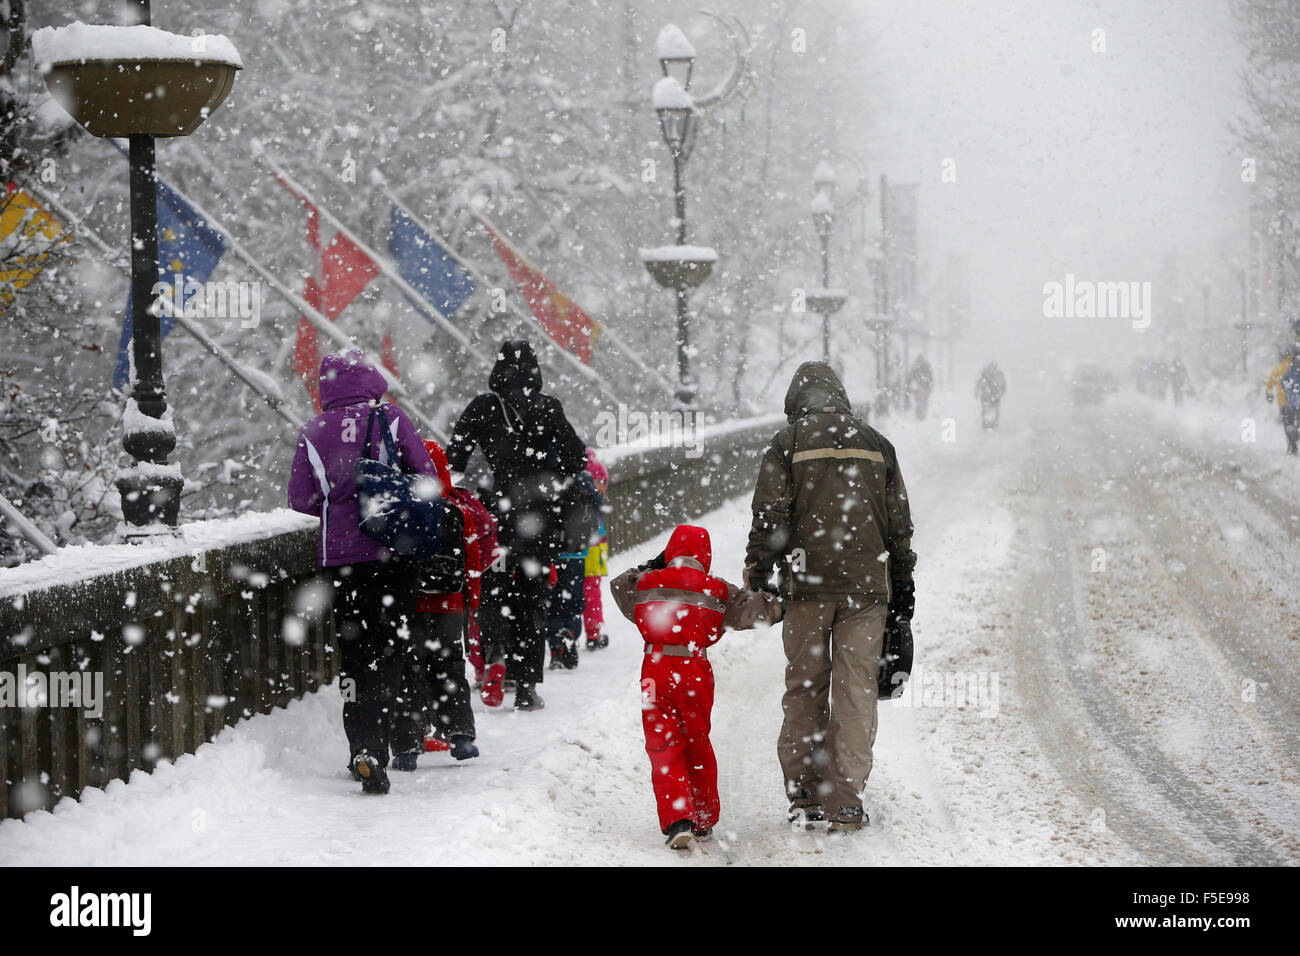 Snowfall, Saint-Gervais-les-Bains, Haute-Savoie, France, Europe - Stock Image